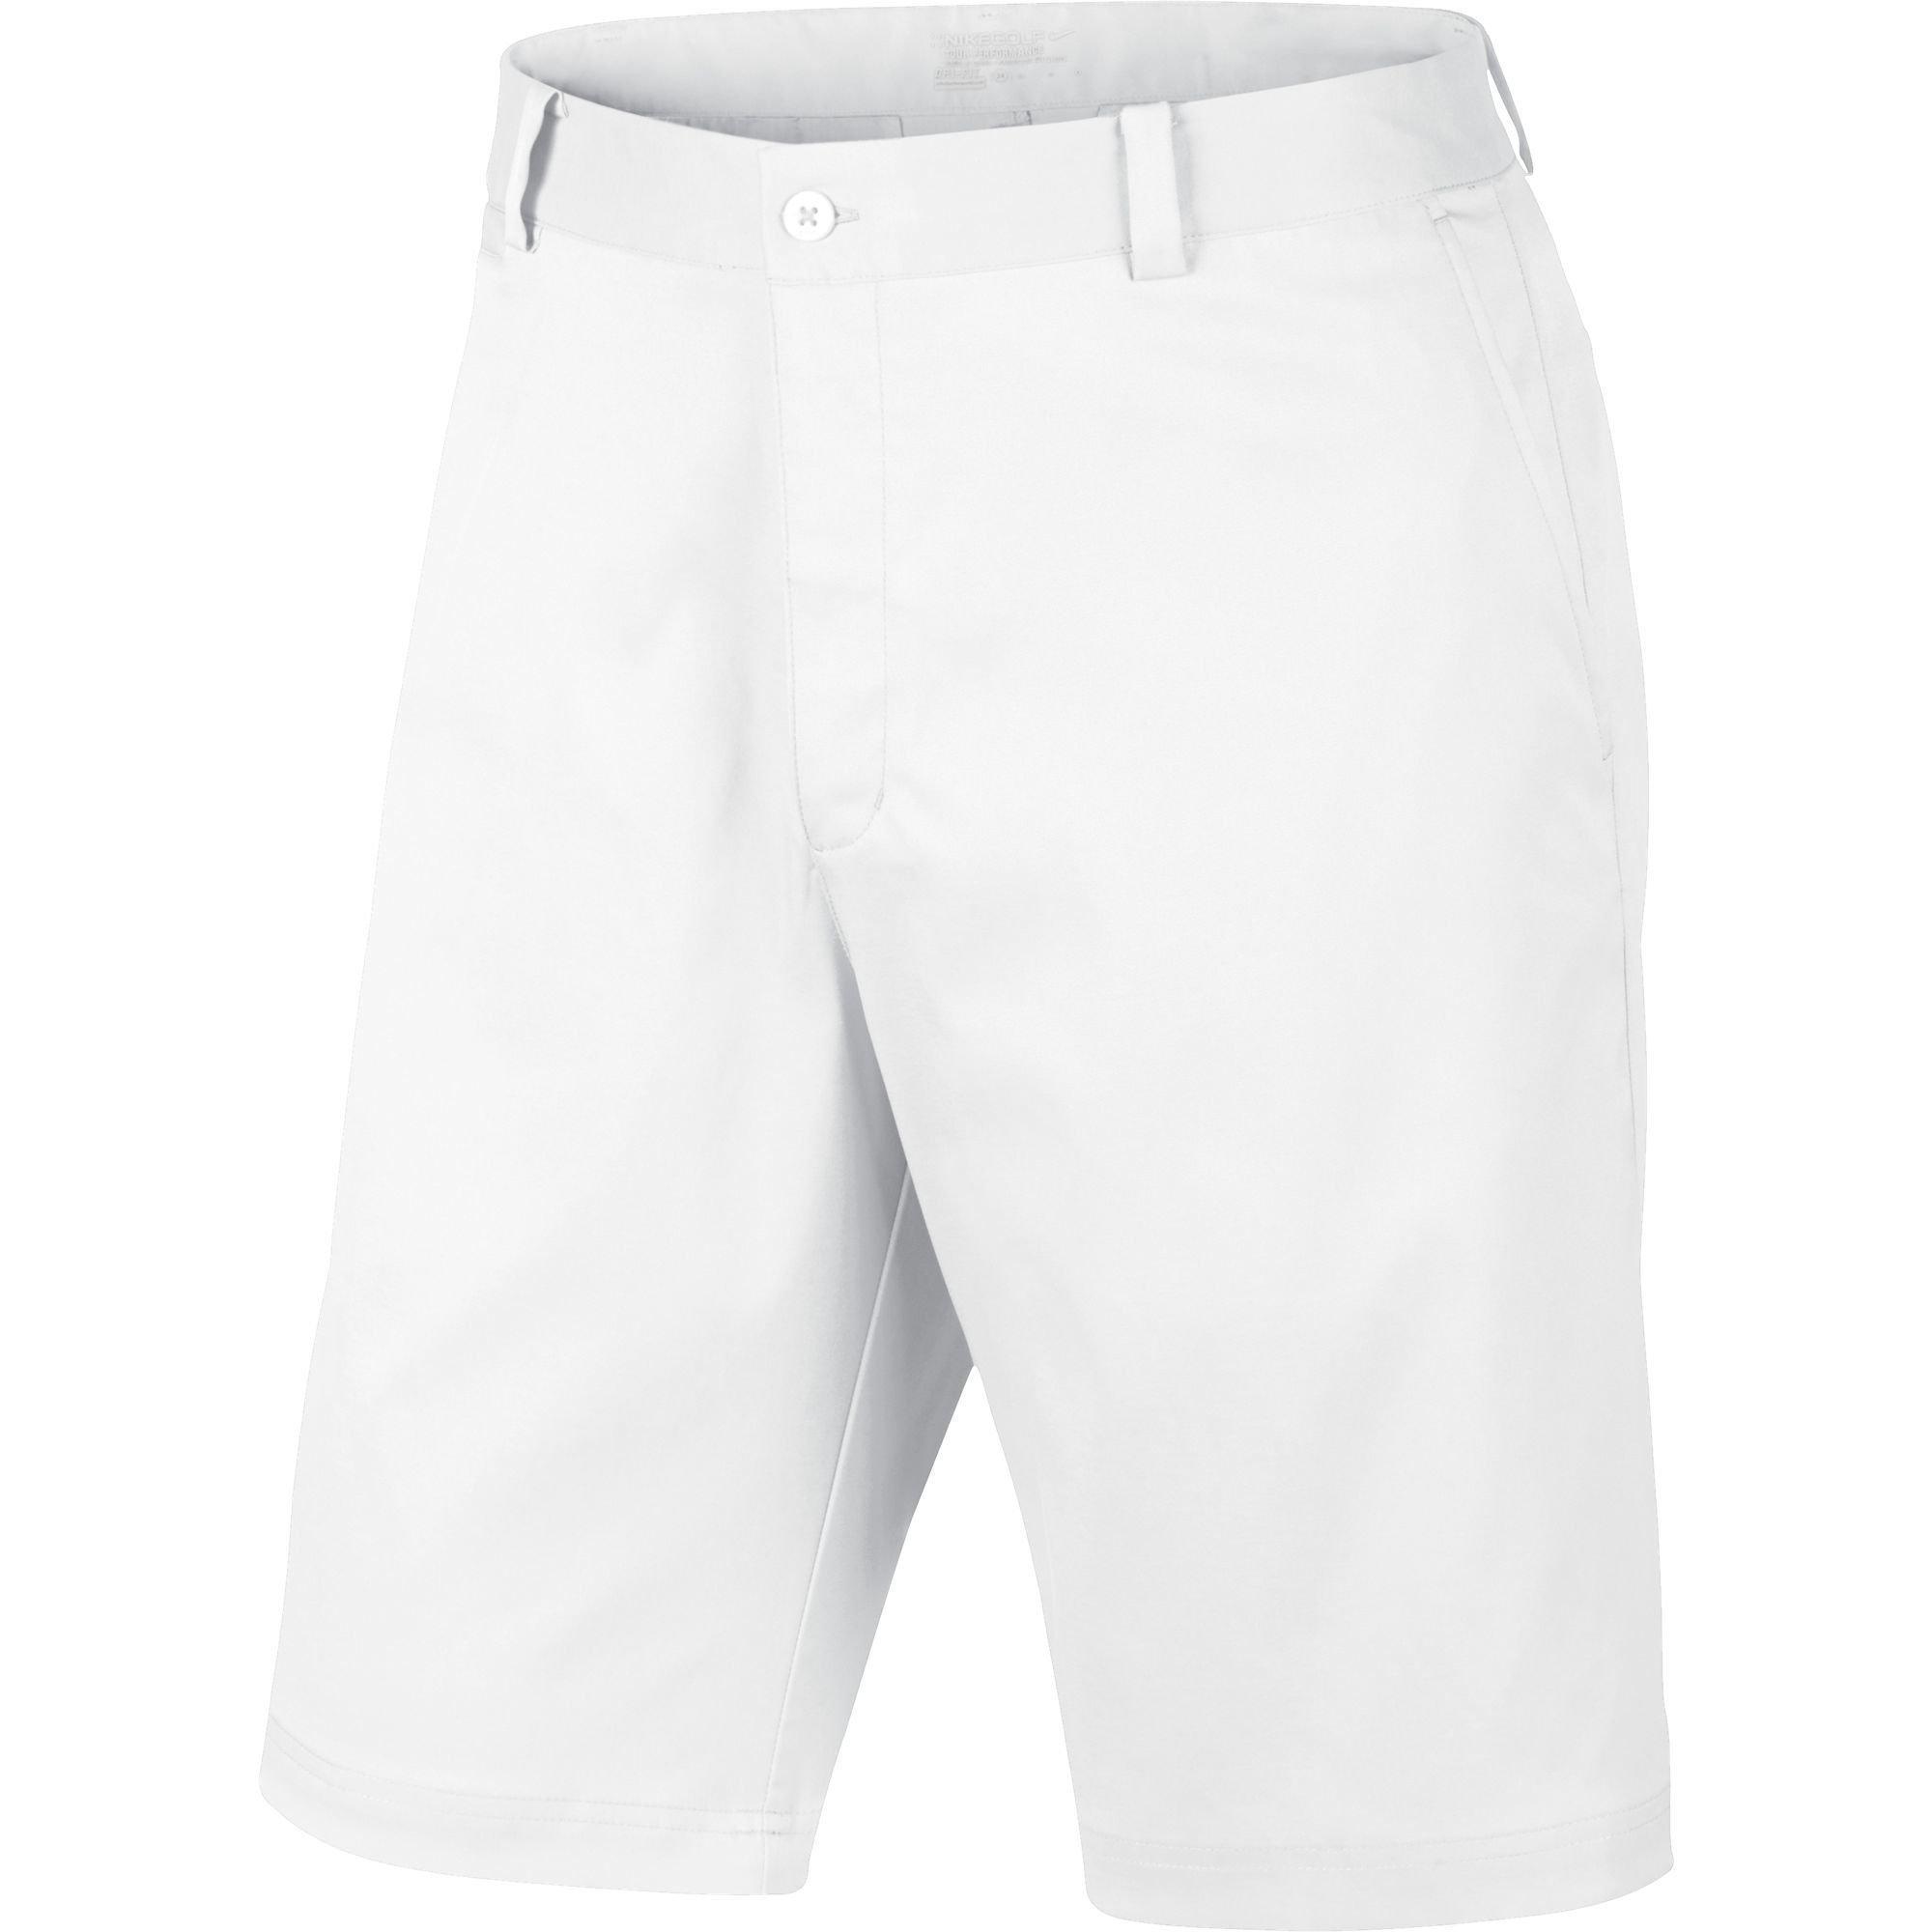 NIKE Men's 11'' Dri Fit Flat Front Golf Shorts, White, 34 Waist, 639798 100